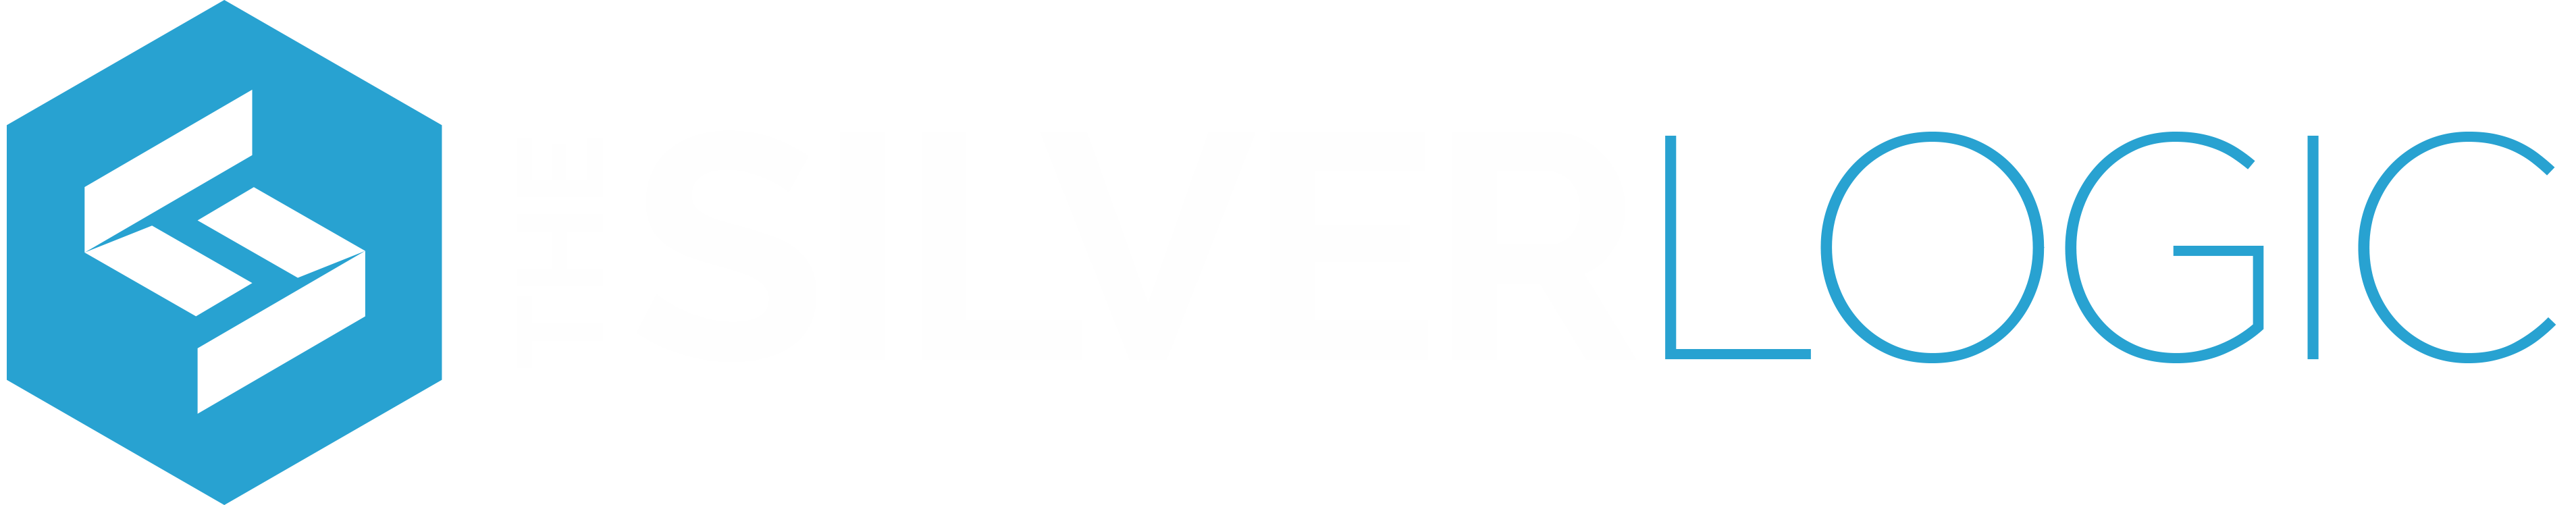 SilverLogic_LOGO_2018-white.png